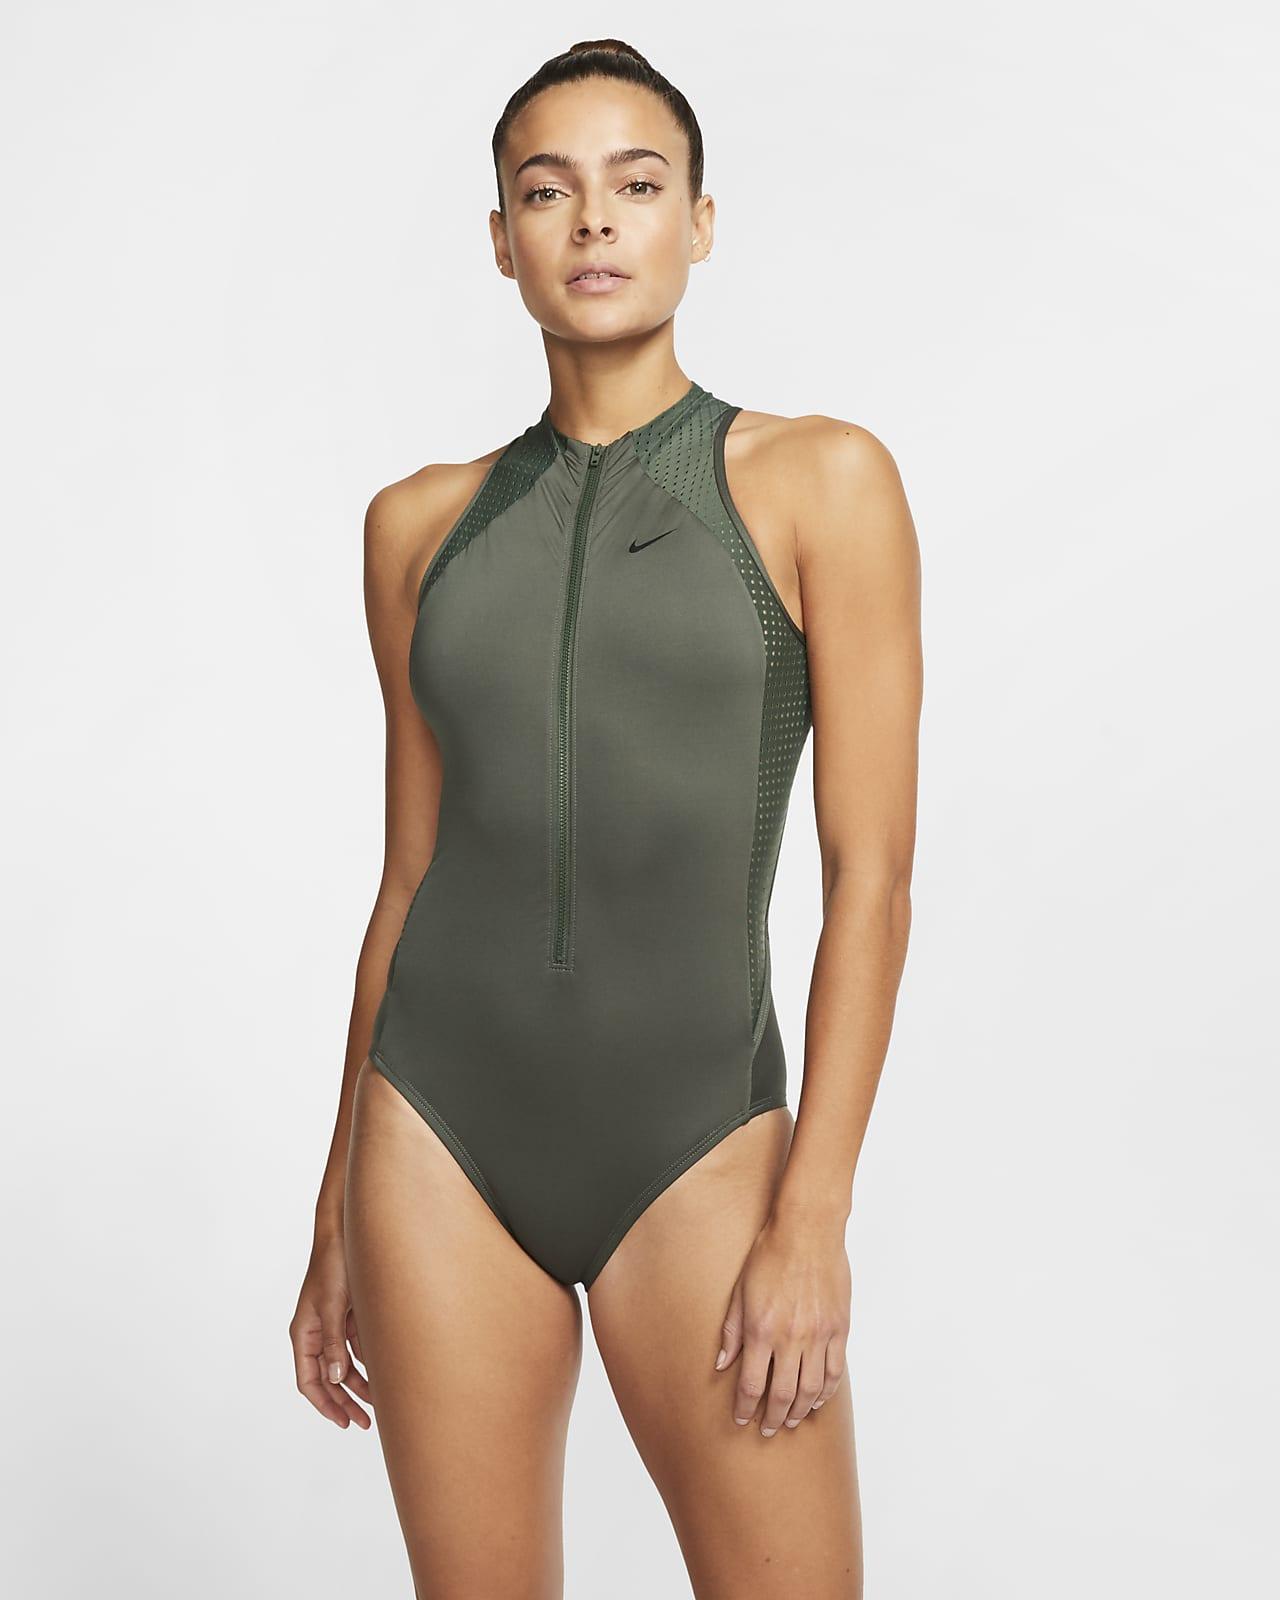 Nike Sport Mesh Women's Zip 1-Piece